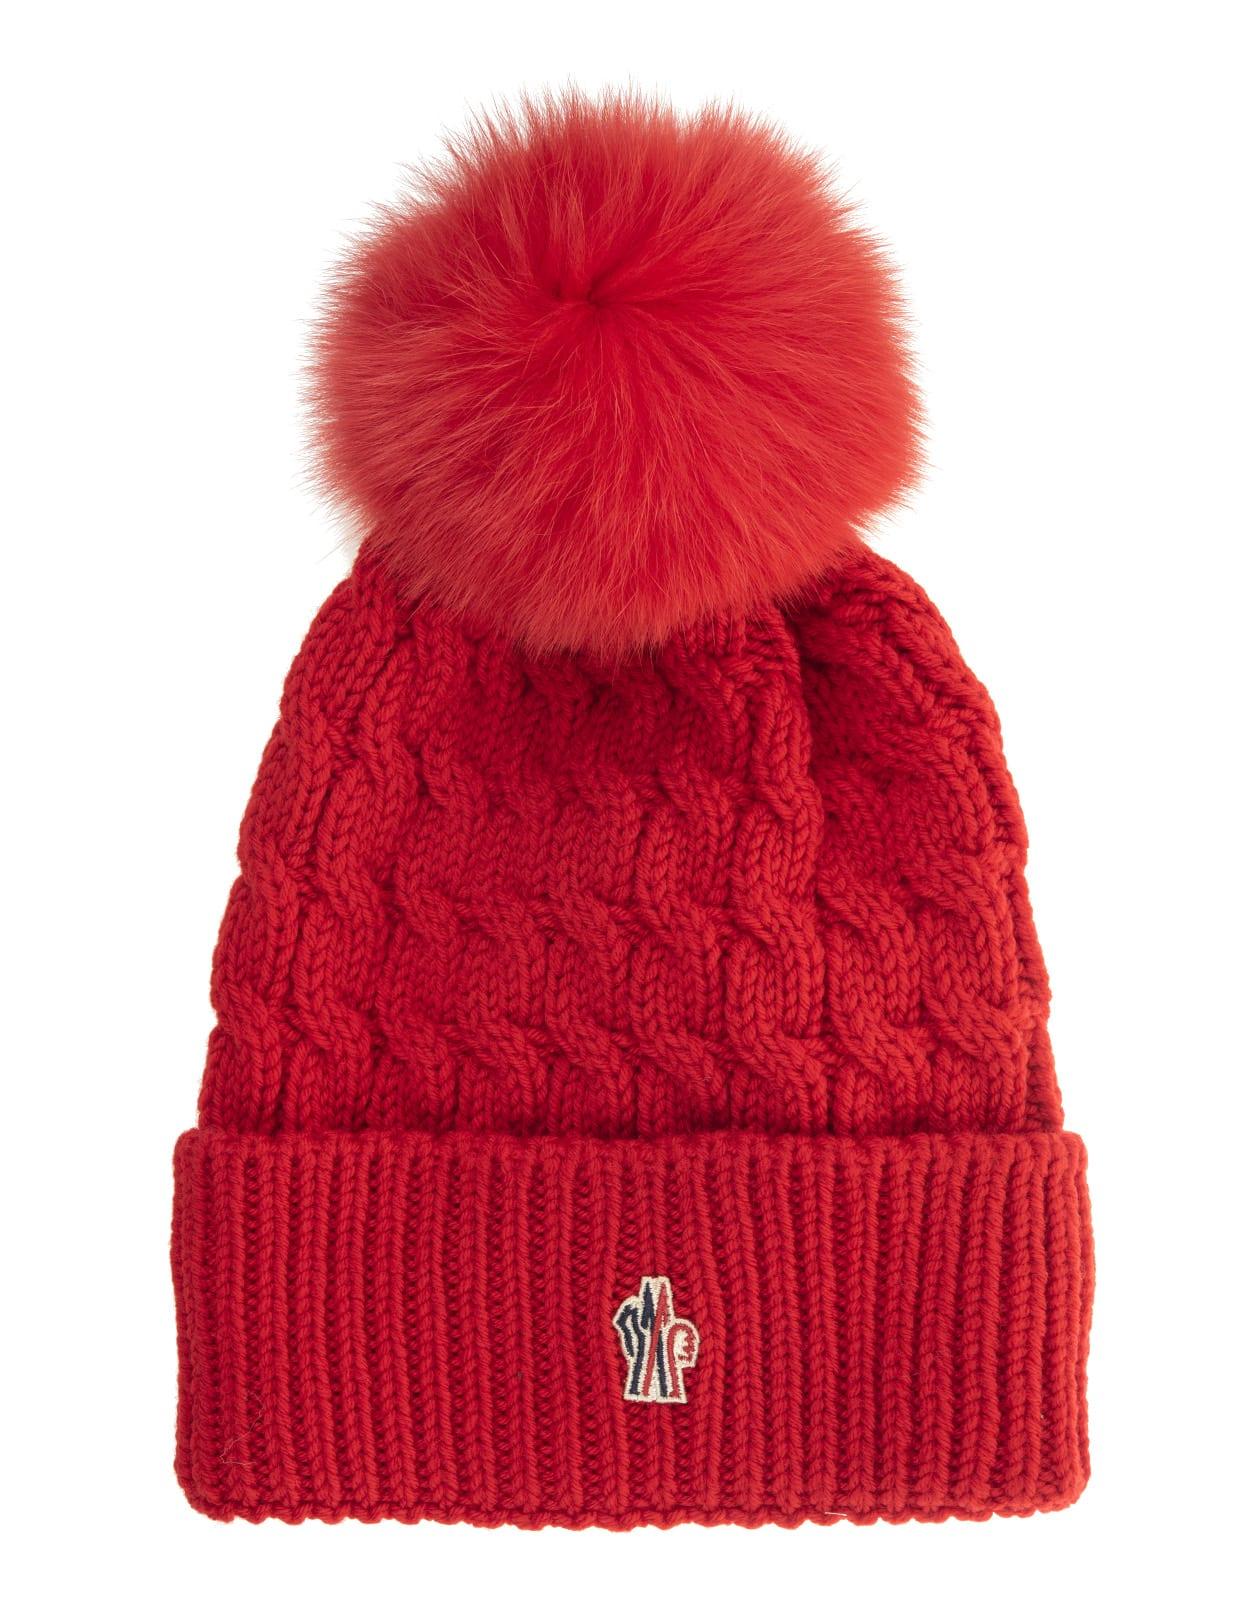 Red apres Ski Moncler Grenoble Woman Hat